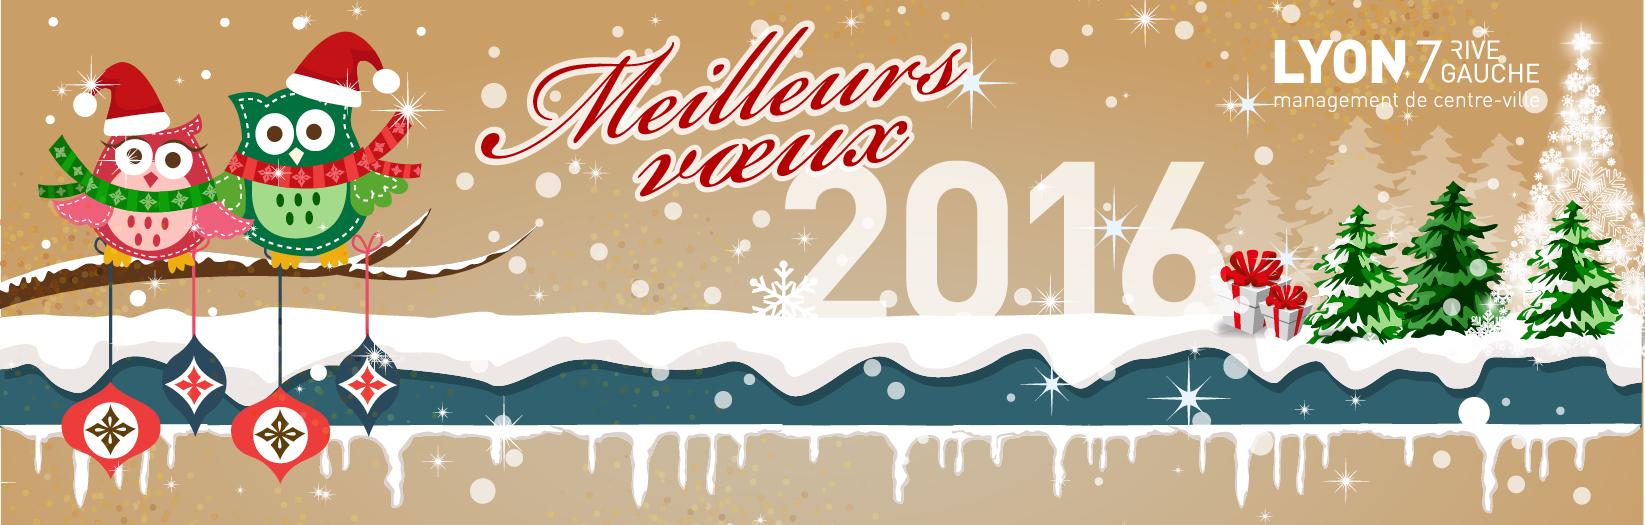 Adieu 2015 - Carte de vœux 2016 -